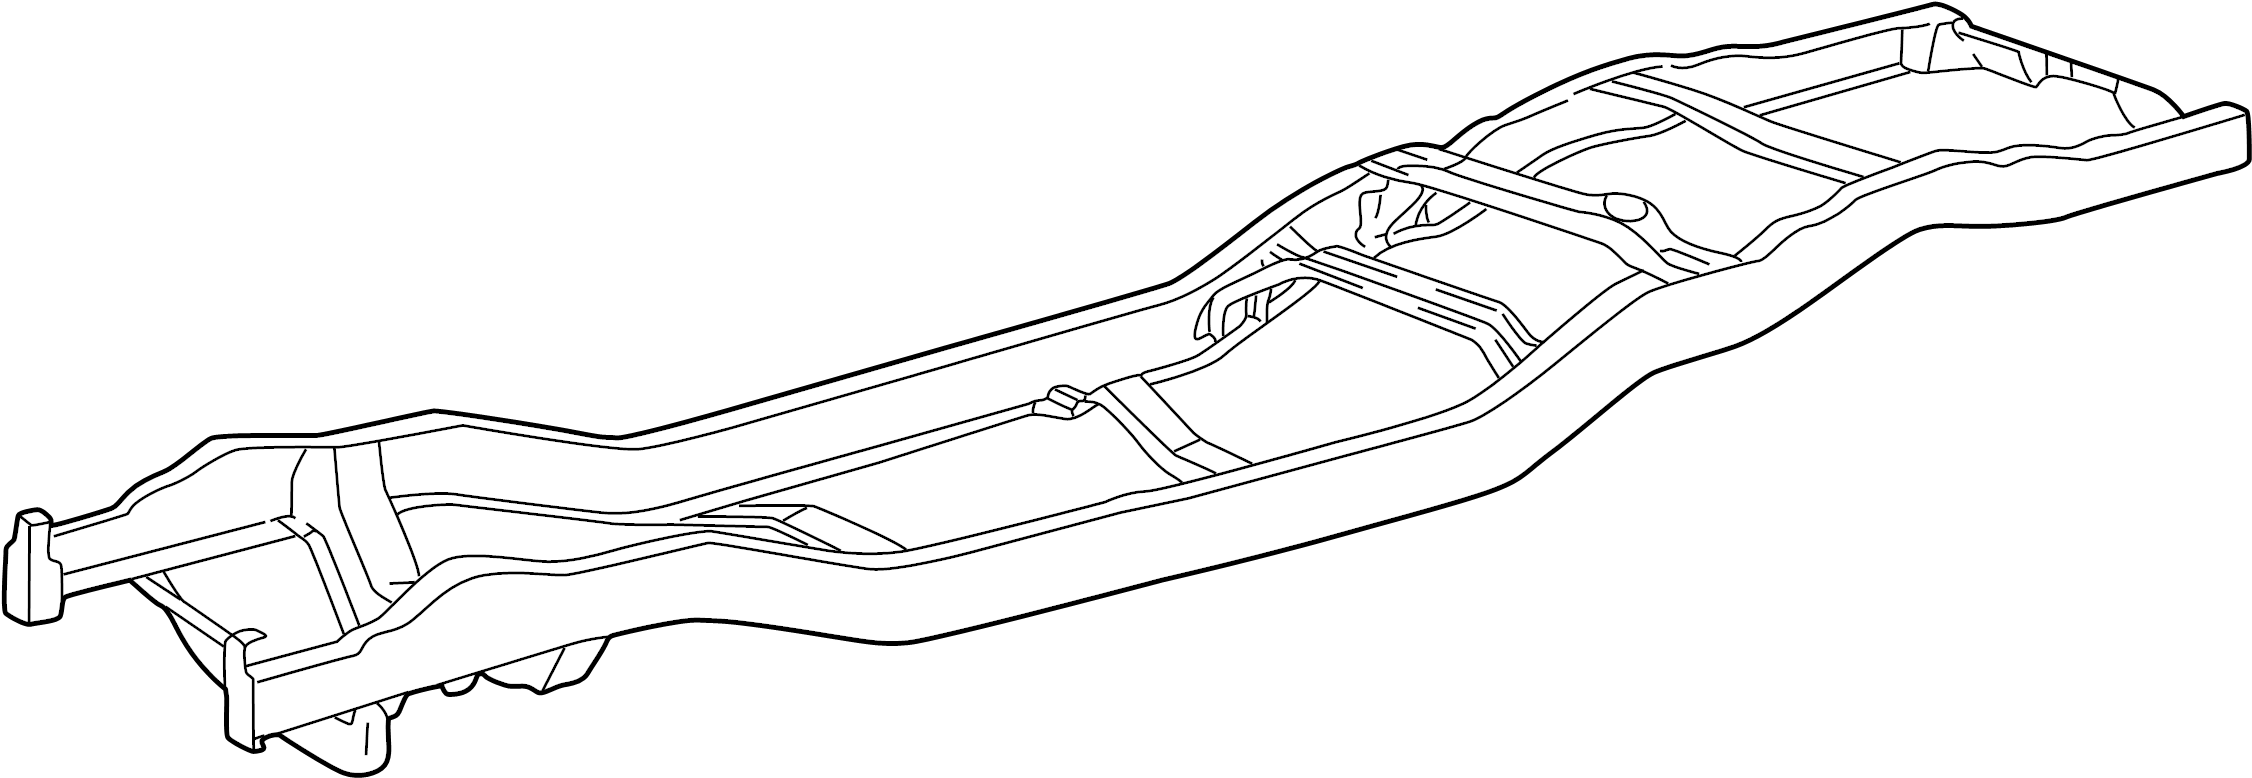 Mazda B3000 Frame Rail. 2WD, w/torsion bar suspension